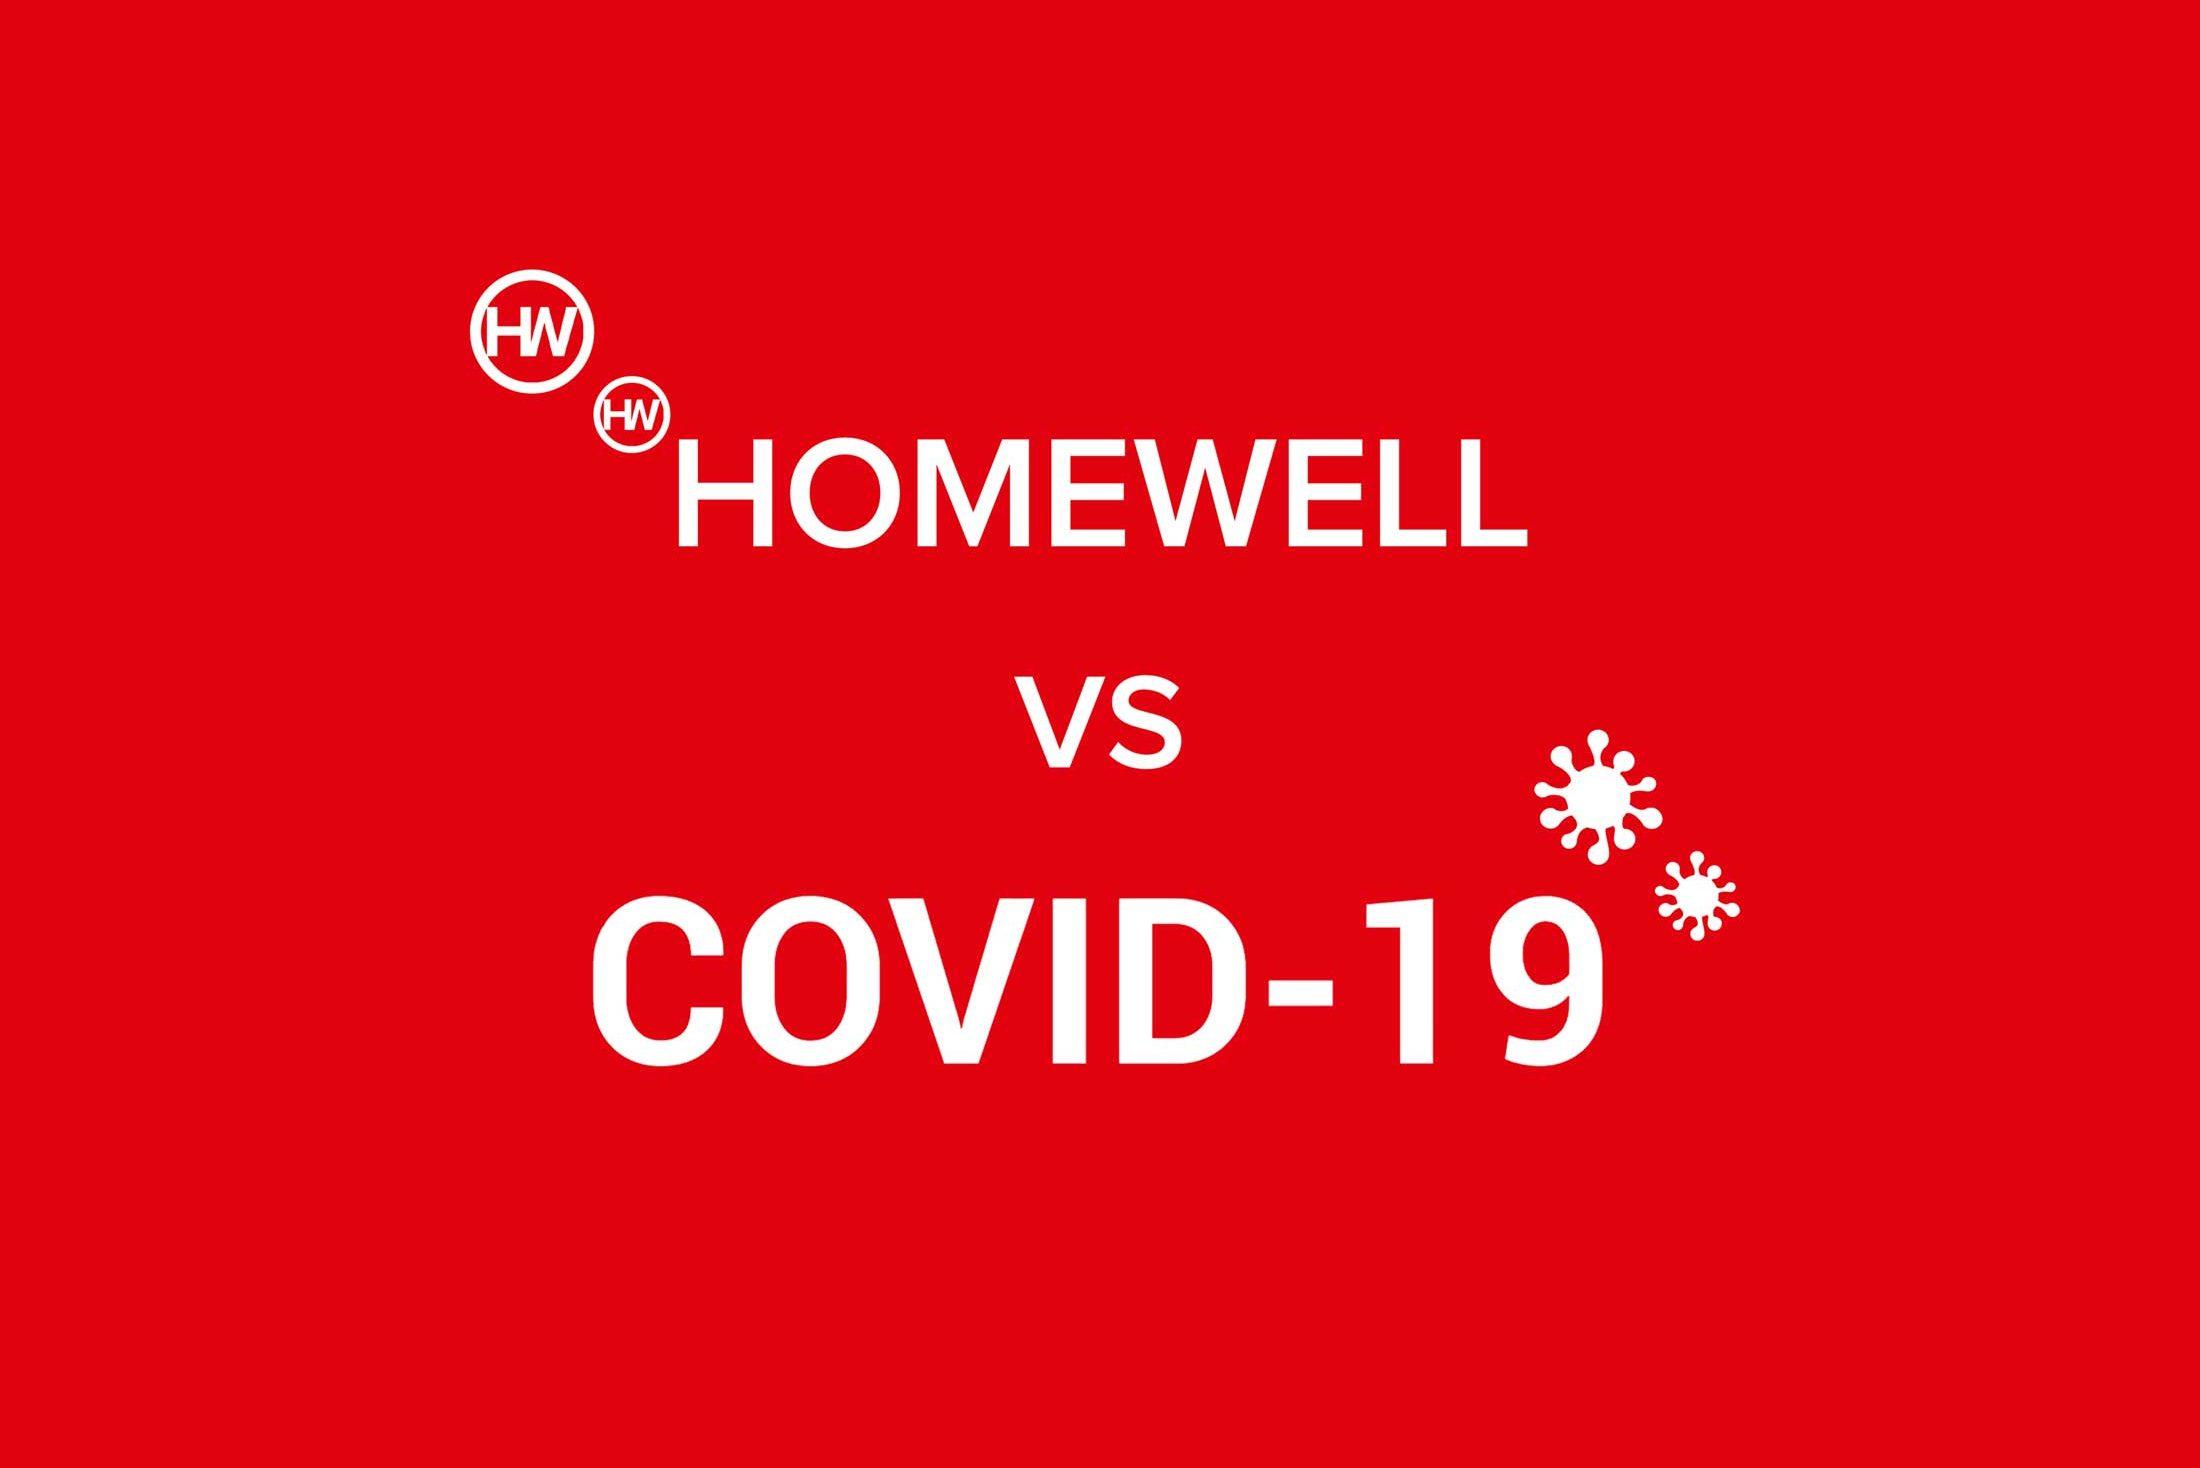 Homewell VS Covid-19